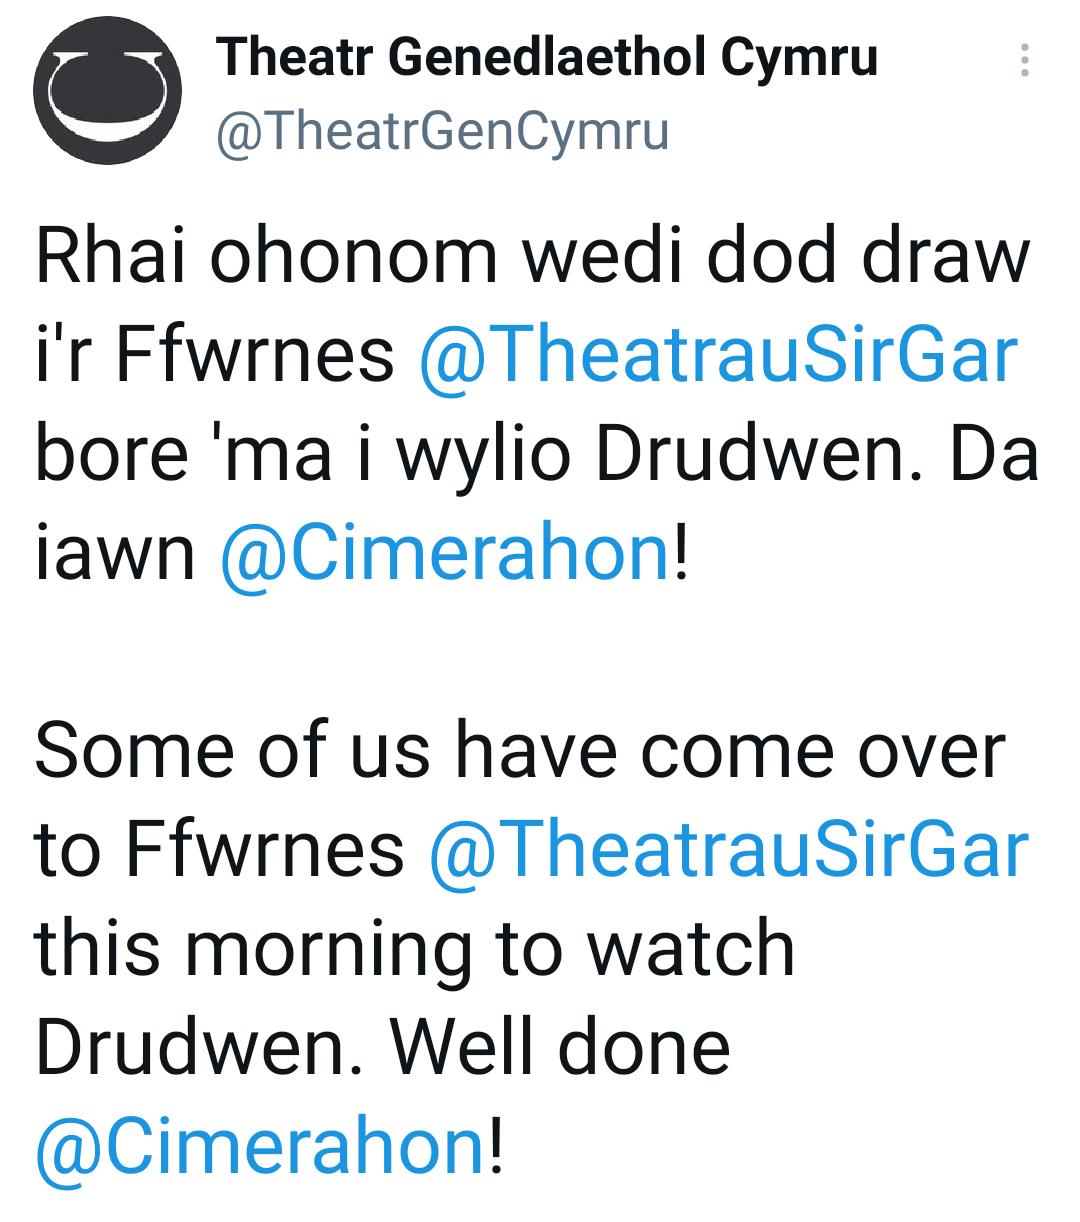 TheatrGenCymru Drudwen tweet